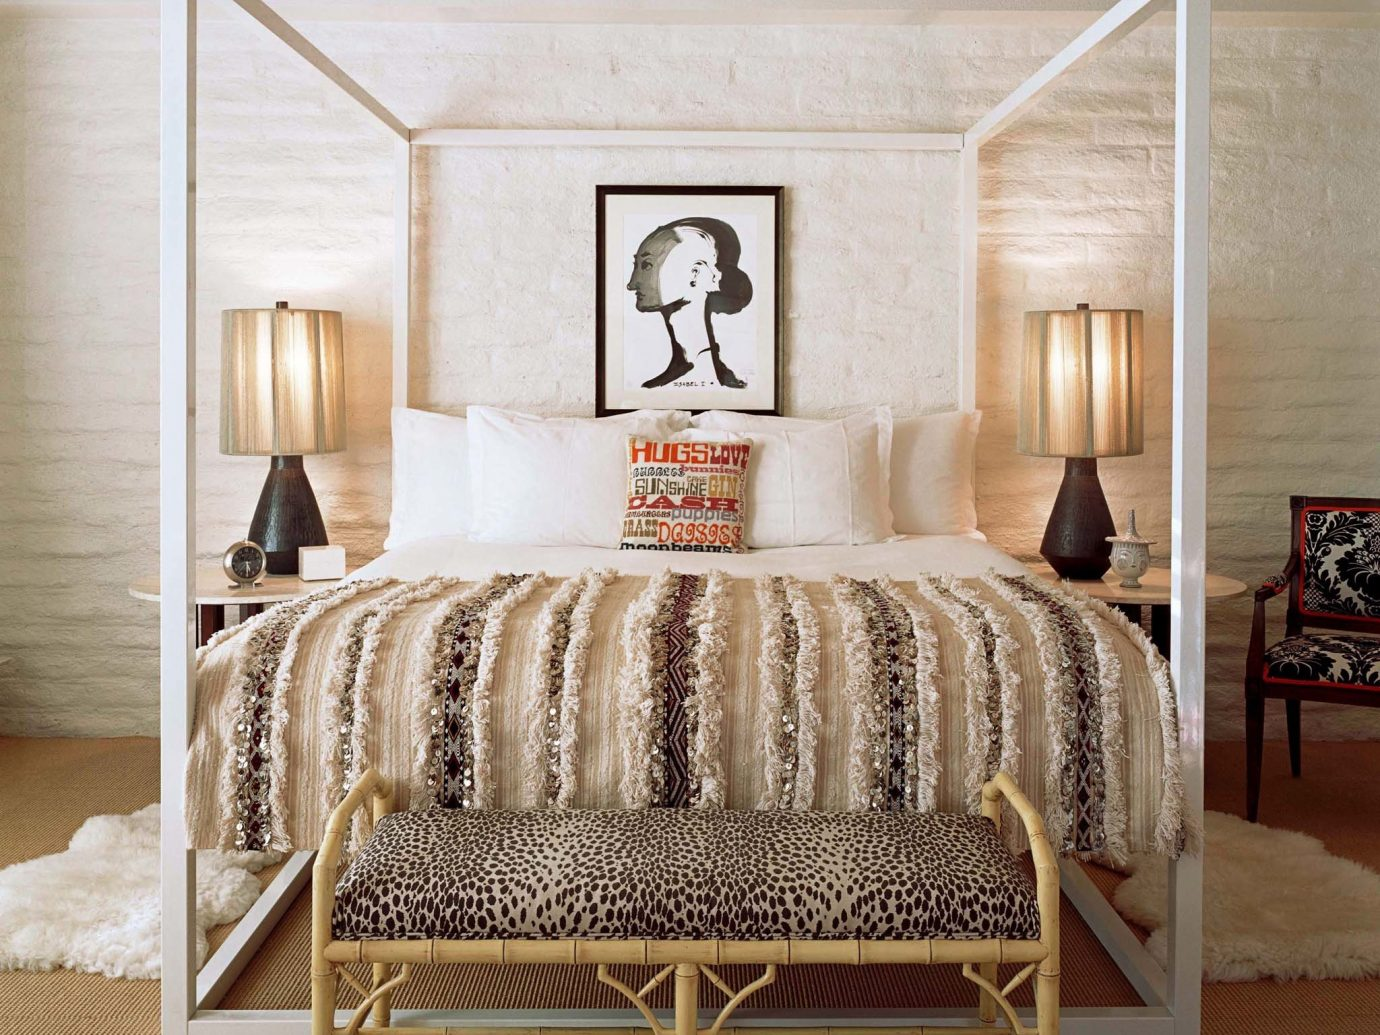 Bedroom Design Hip Hotels Modern Romance floor indoor room furniture chair bed living room interior design wood bed frame table bed sheet studio couch four poster